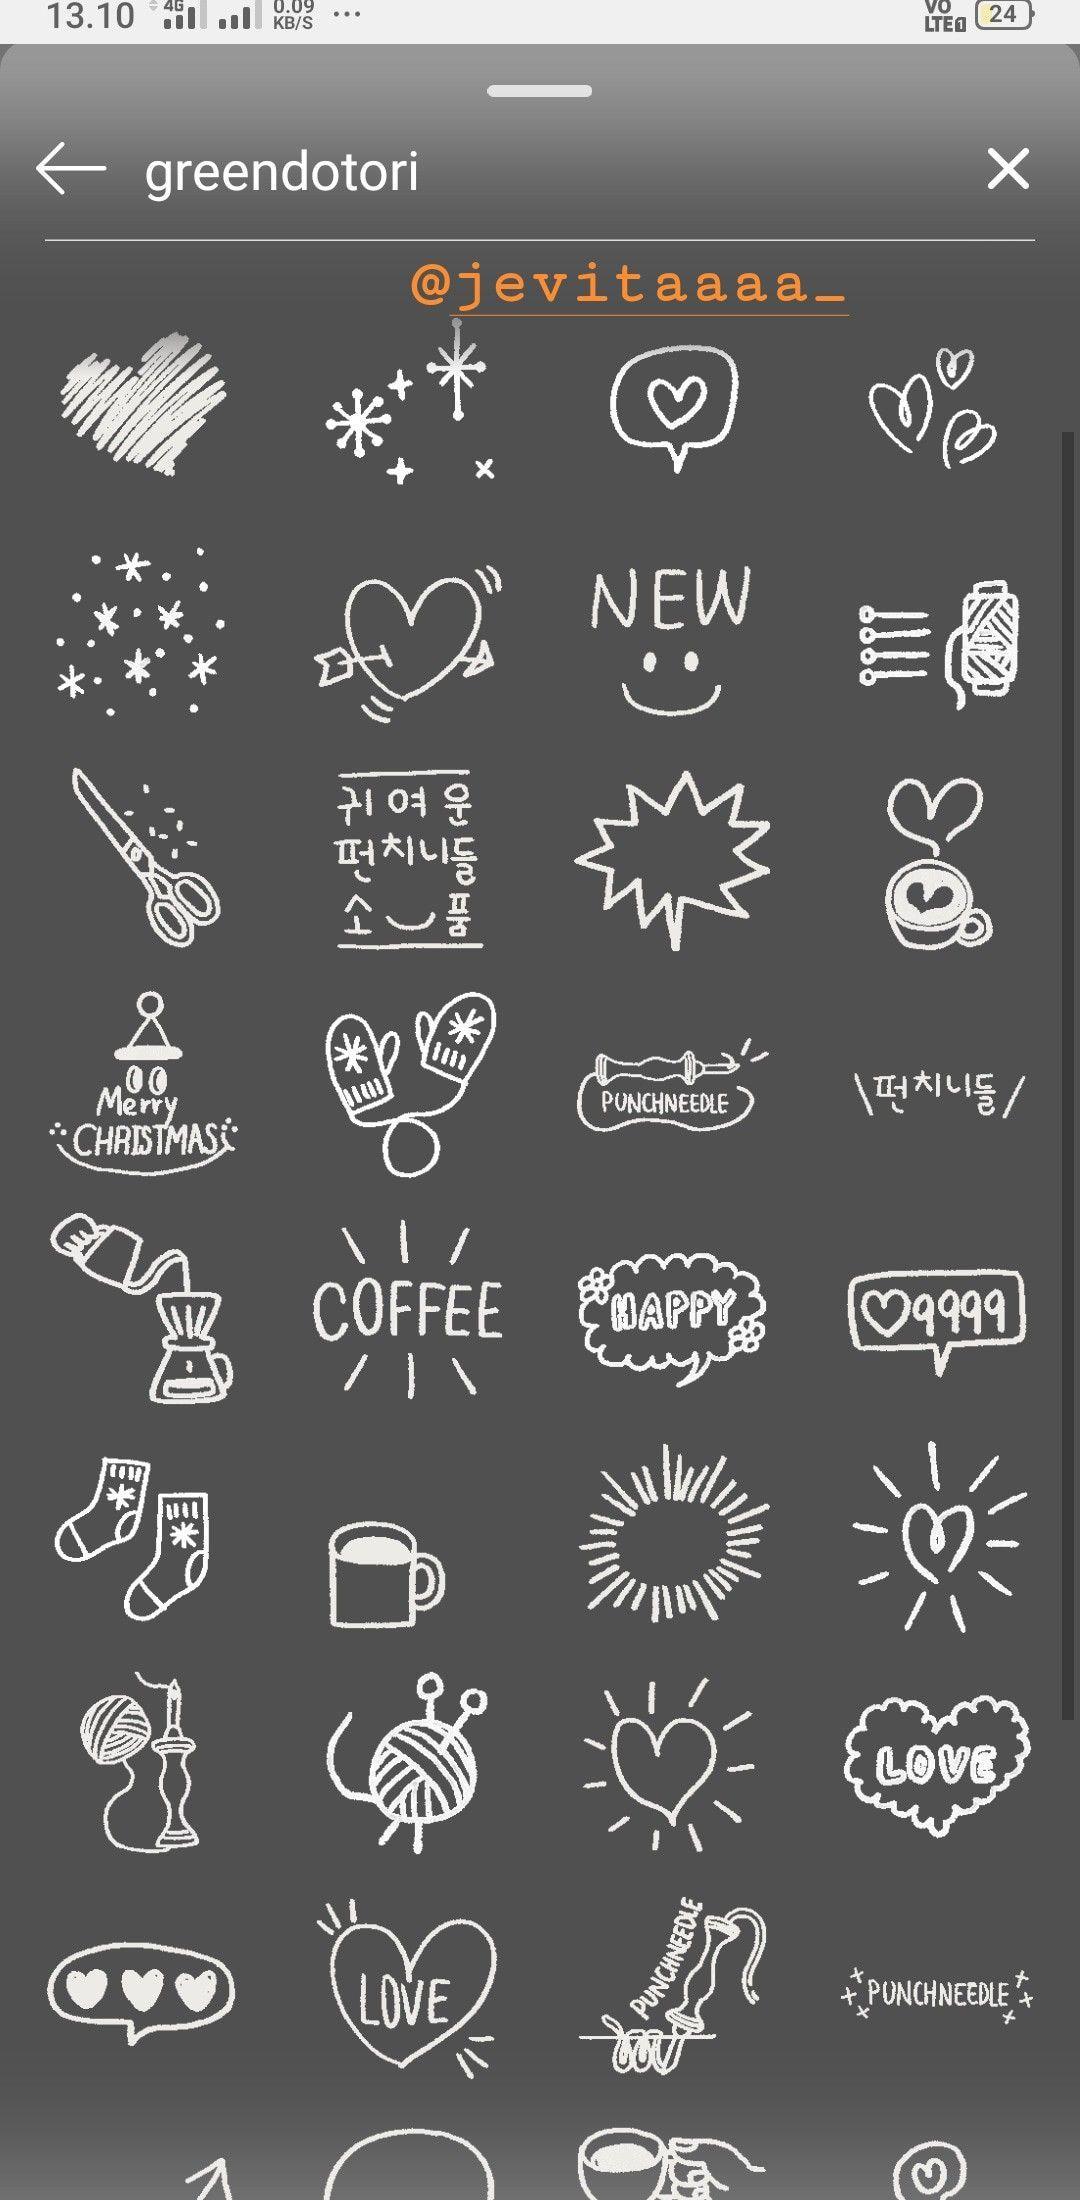 Greendotori Nel 2020 Citazioni Instagram Storie Di Instagram